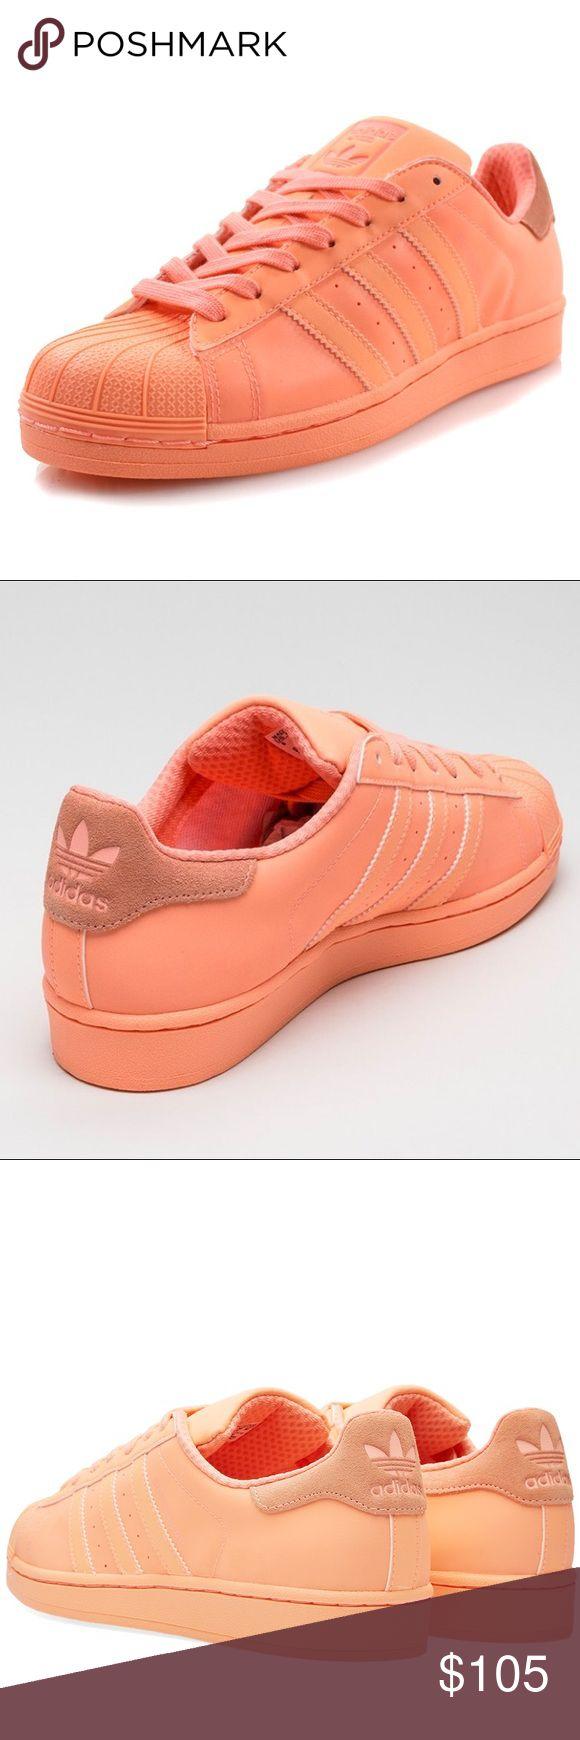 adidas superstar 80 boys adidas high tops adidas shoes for women